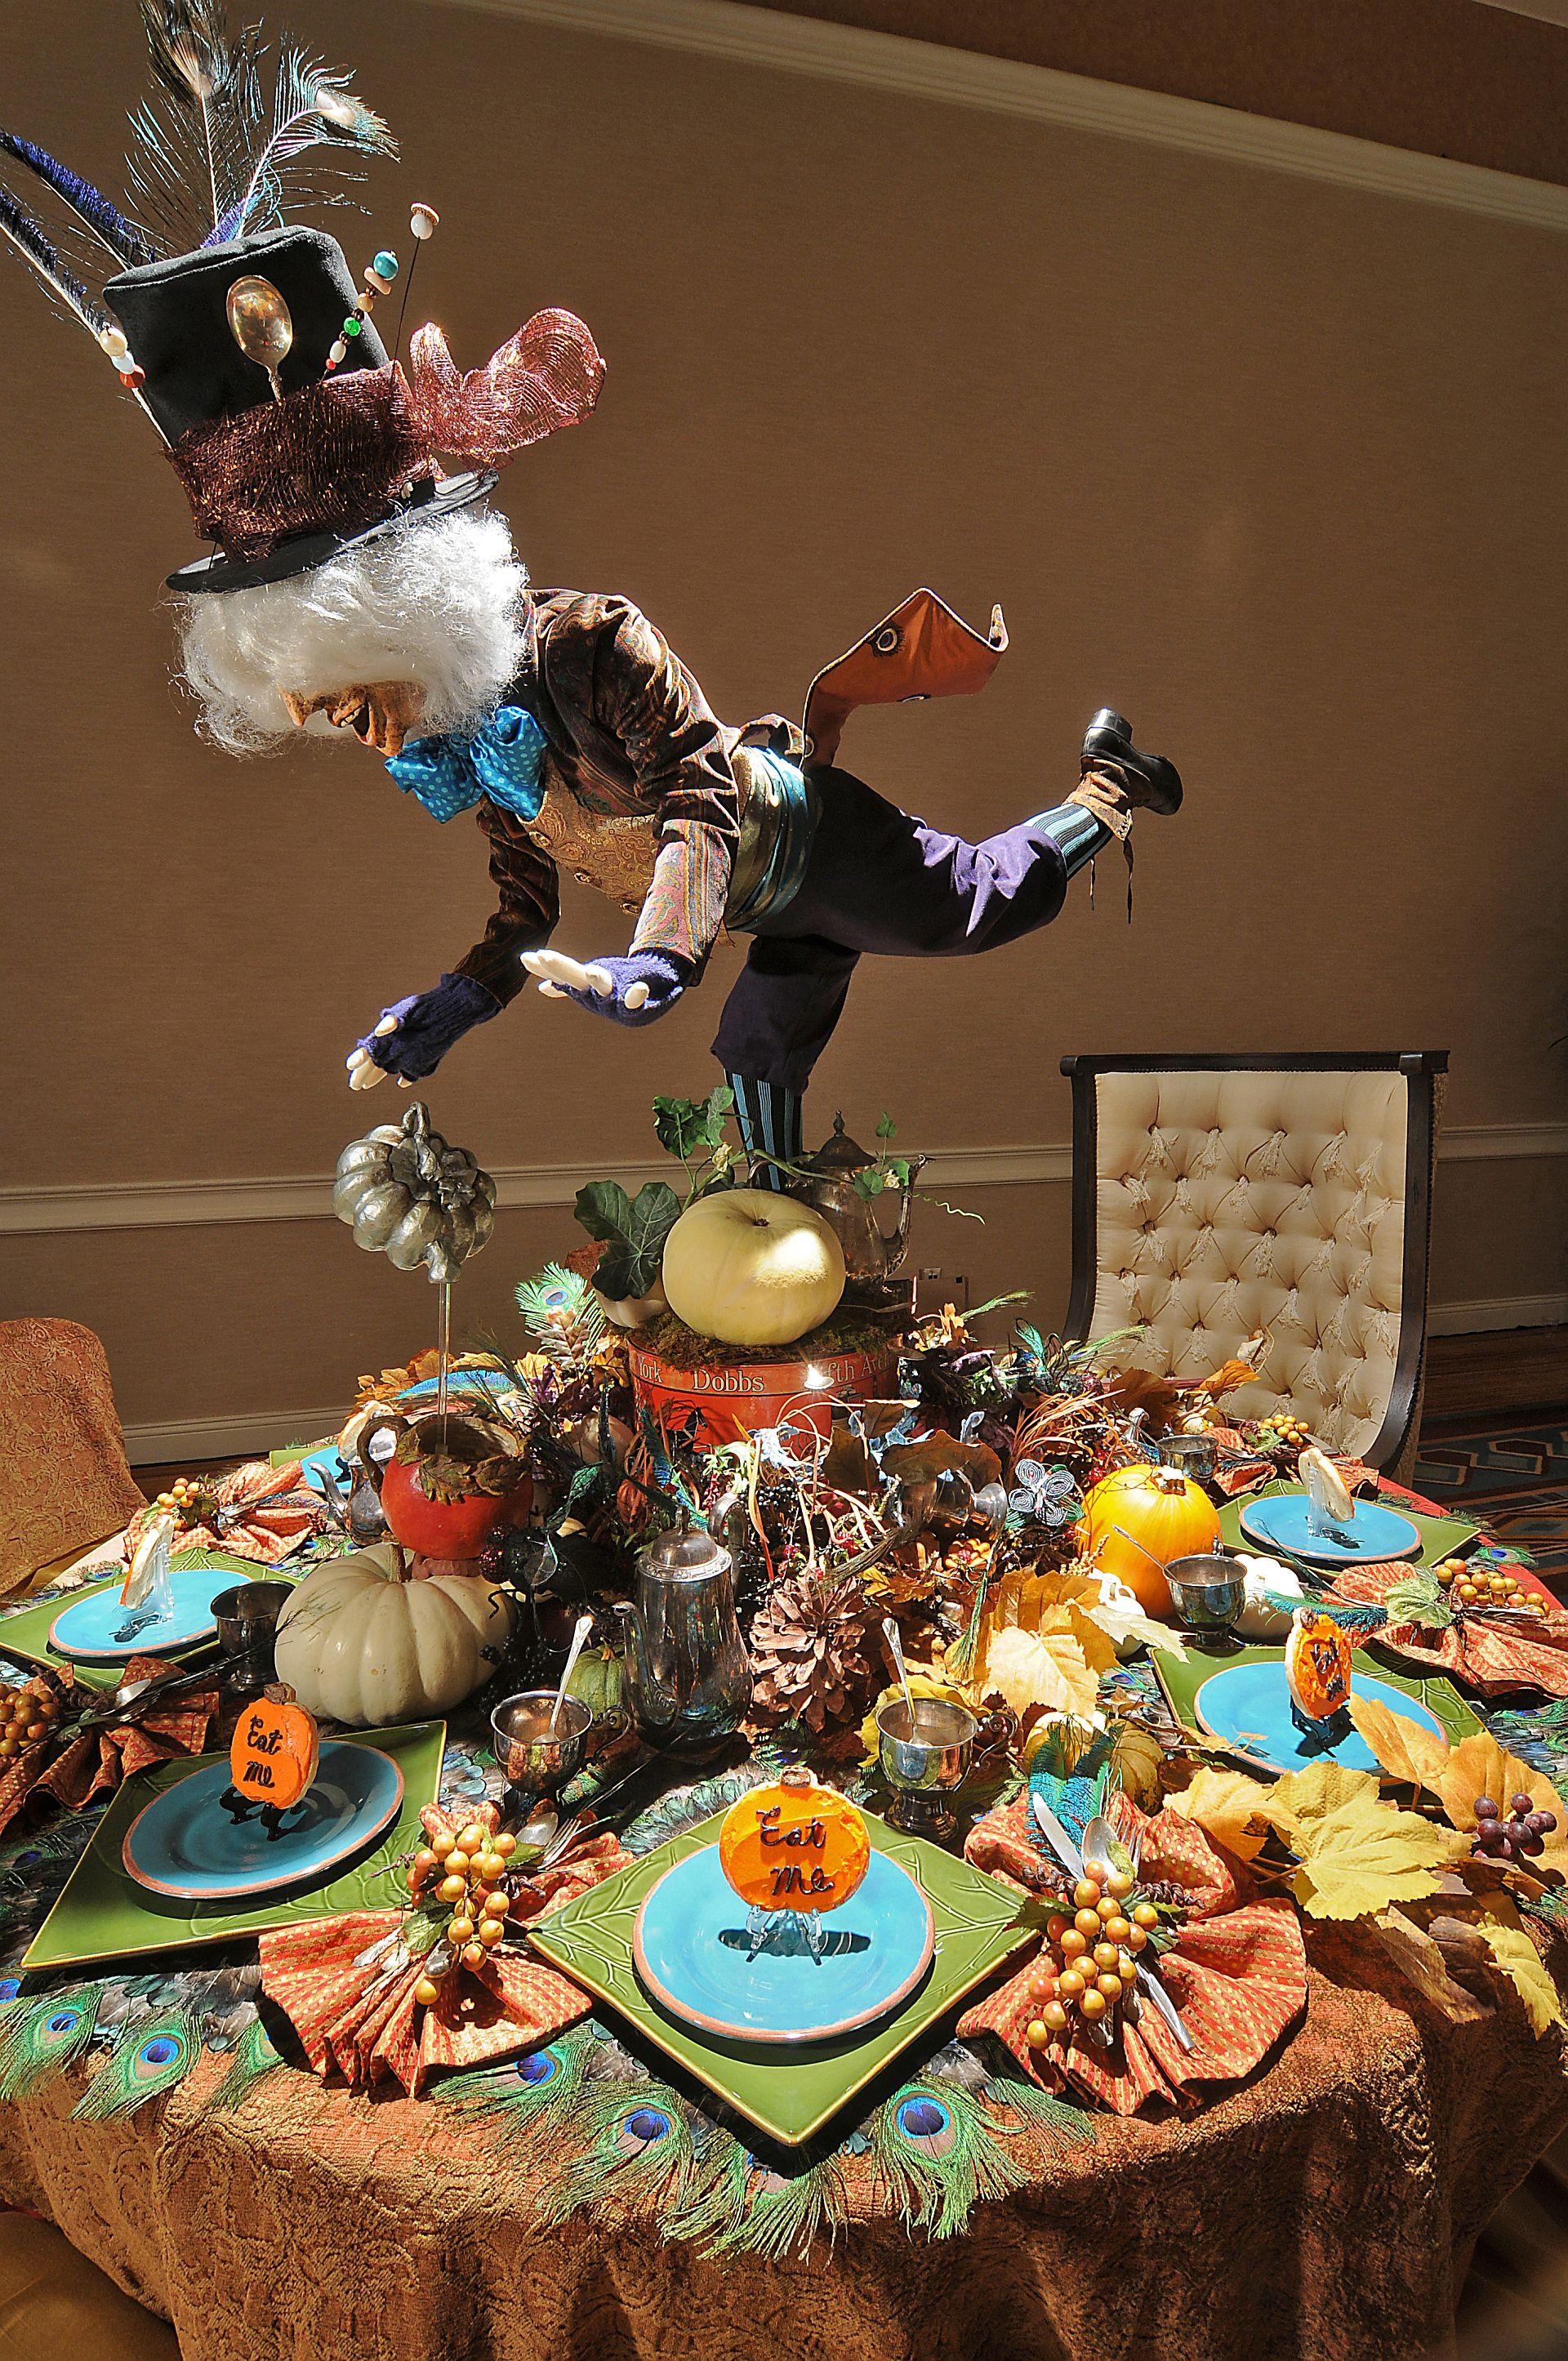 vintage peacock chair banded swivel blind autumn tea party | cindy elle